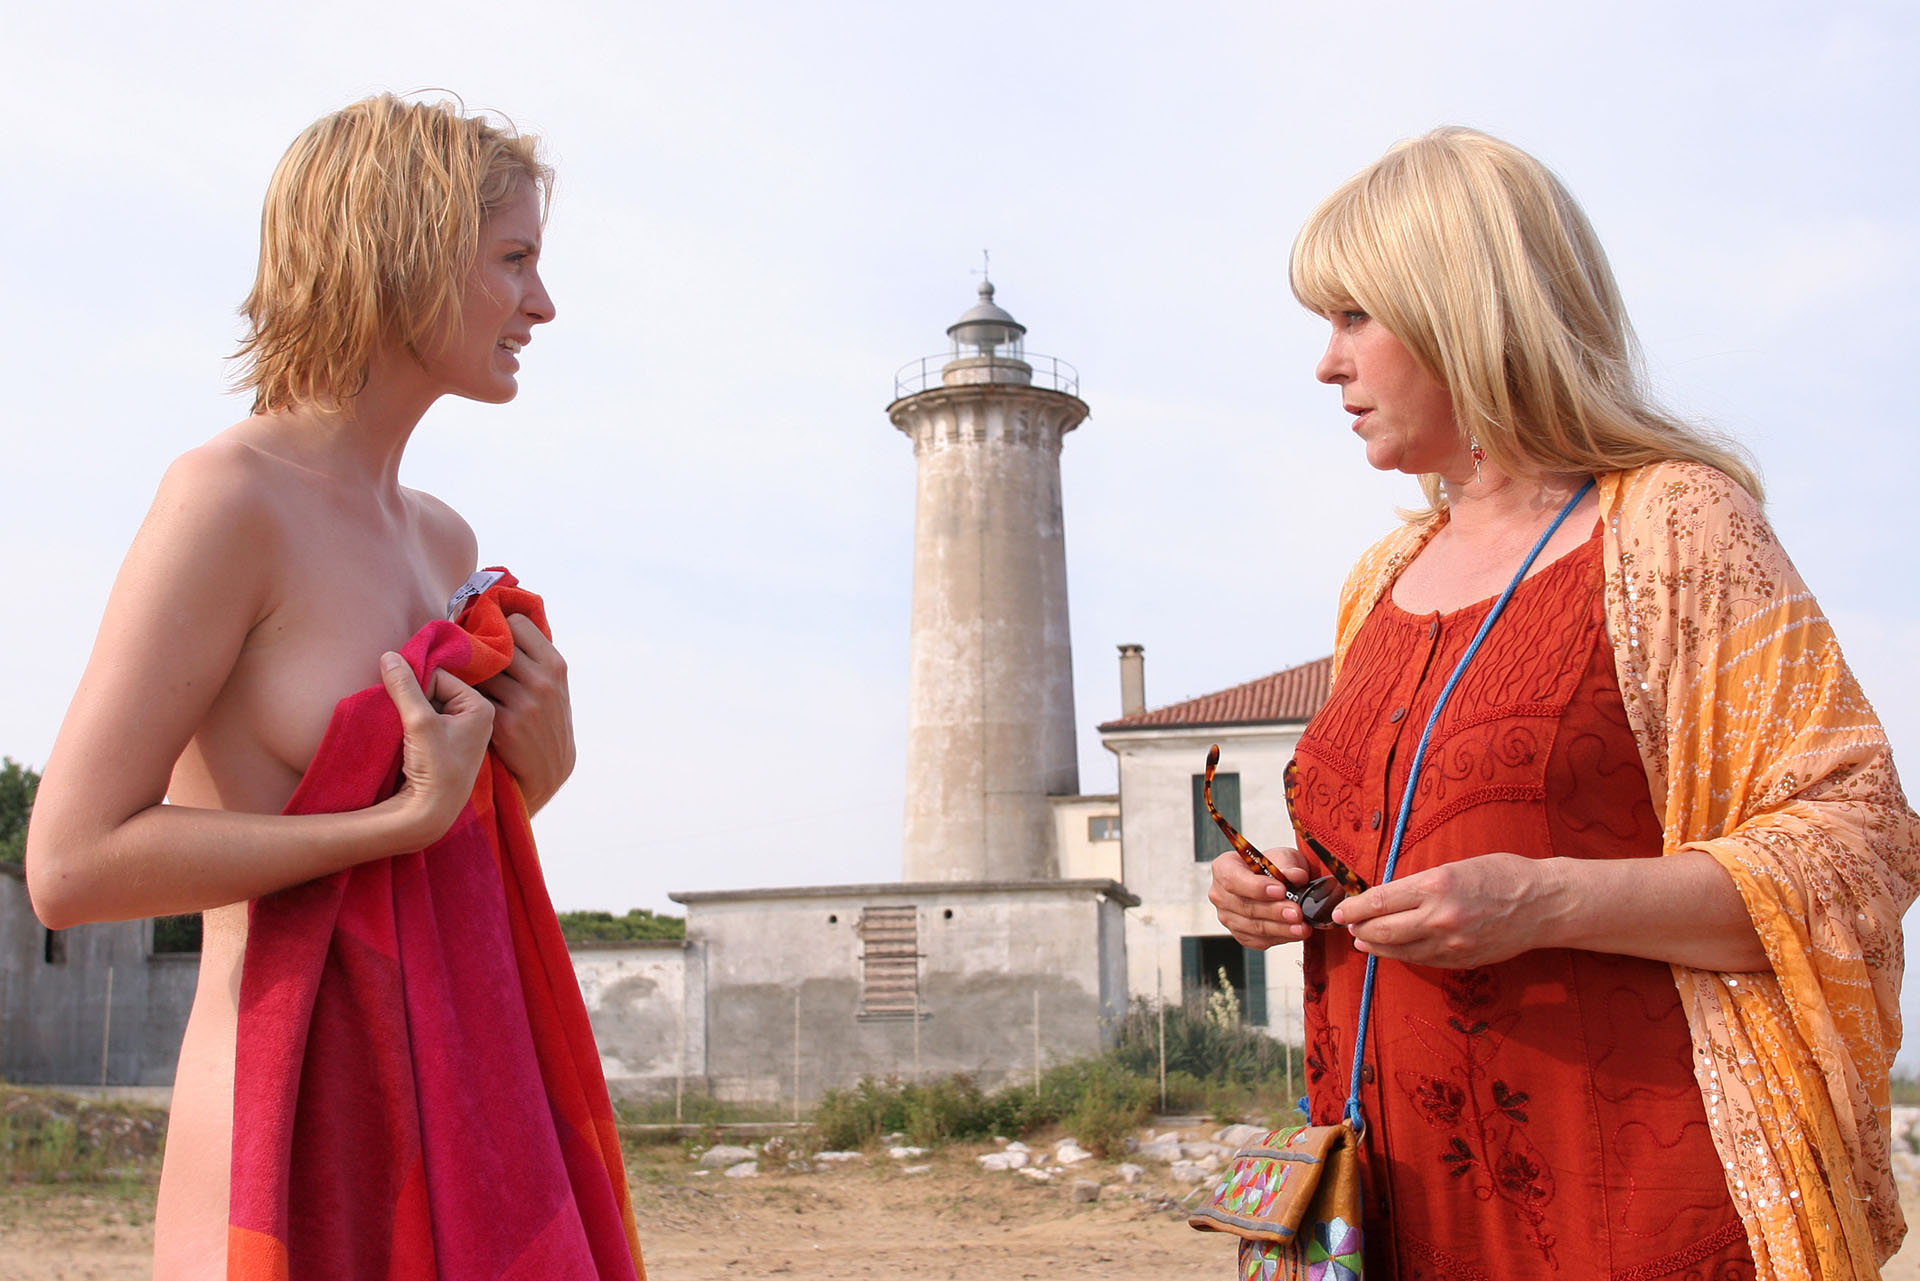 © ORF / Petro Domenigg (Star*Film) - Stefanie Frischeis, Elfi Eschke